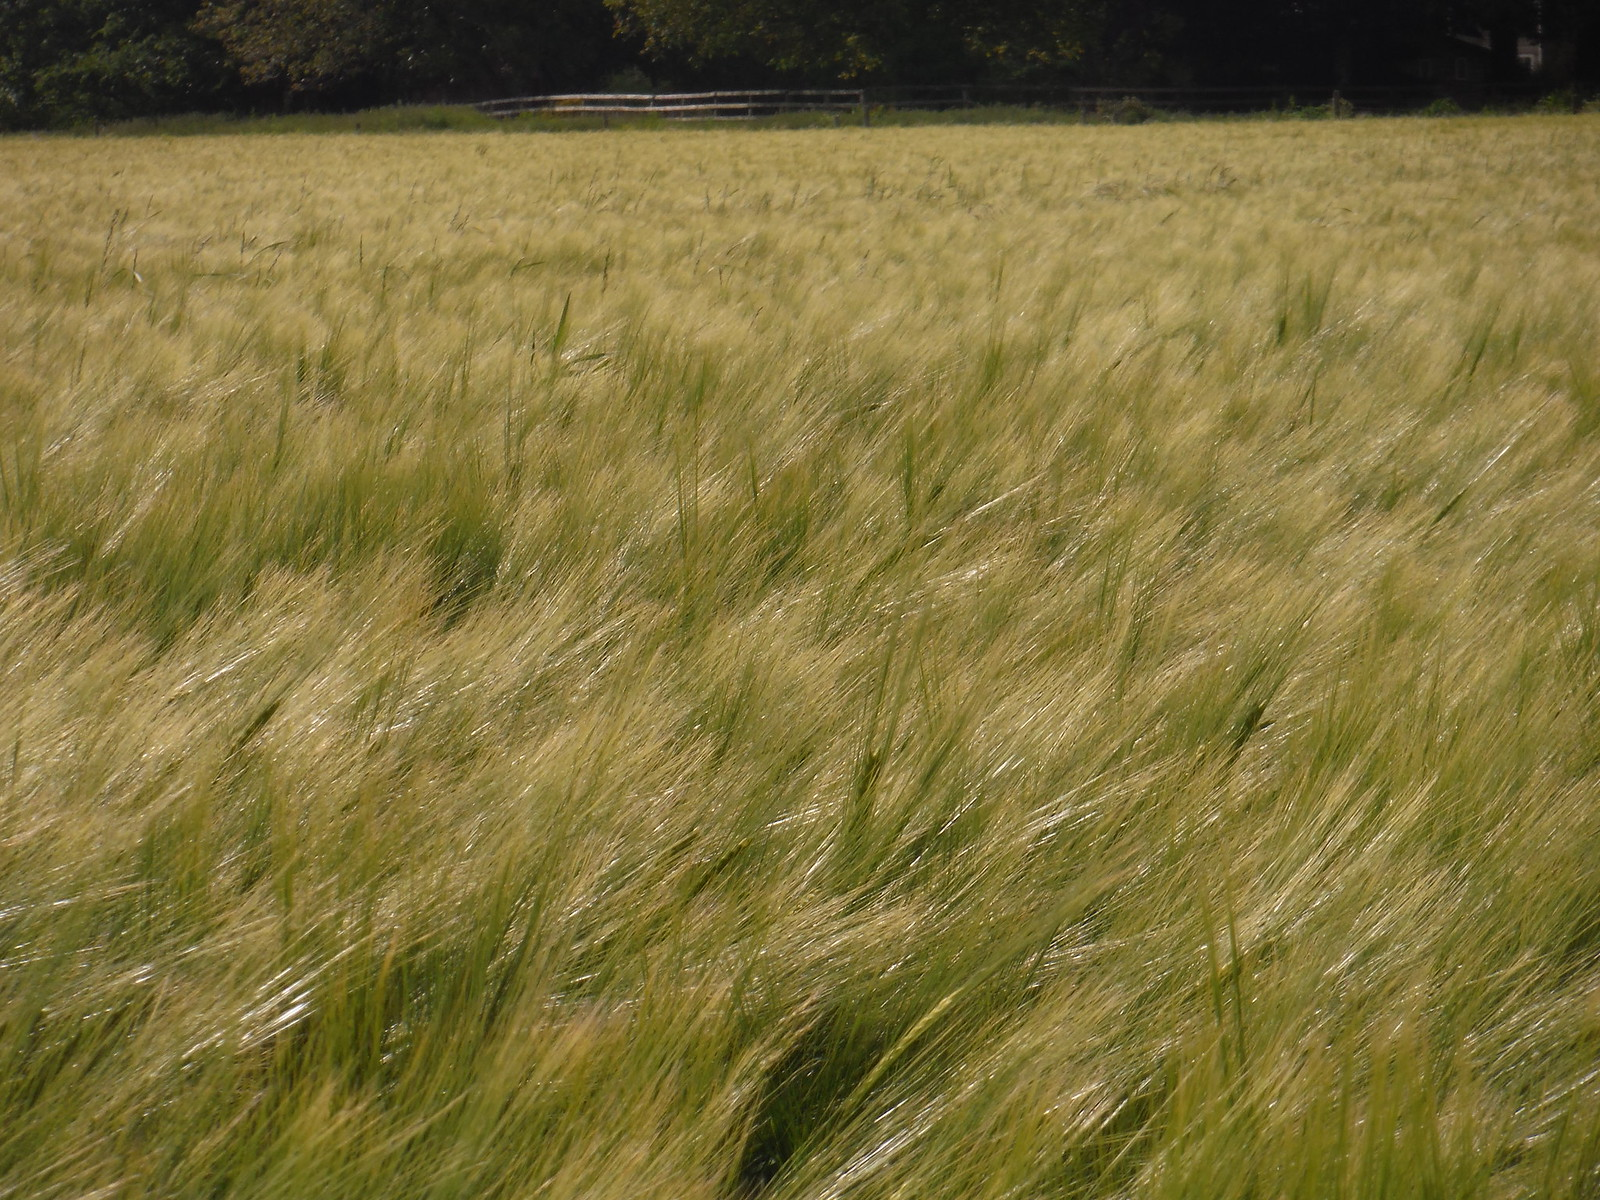 Field in Spring SWC Walk 249 Tisbury Circular via Dinton and Fovant